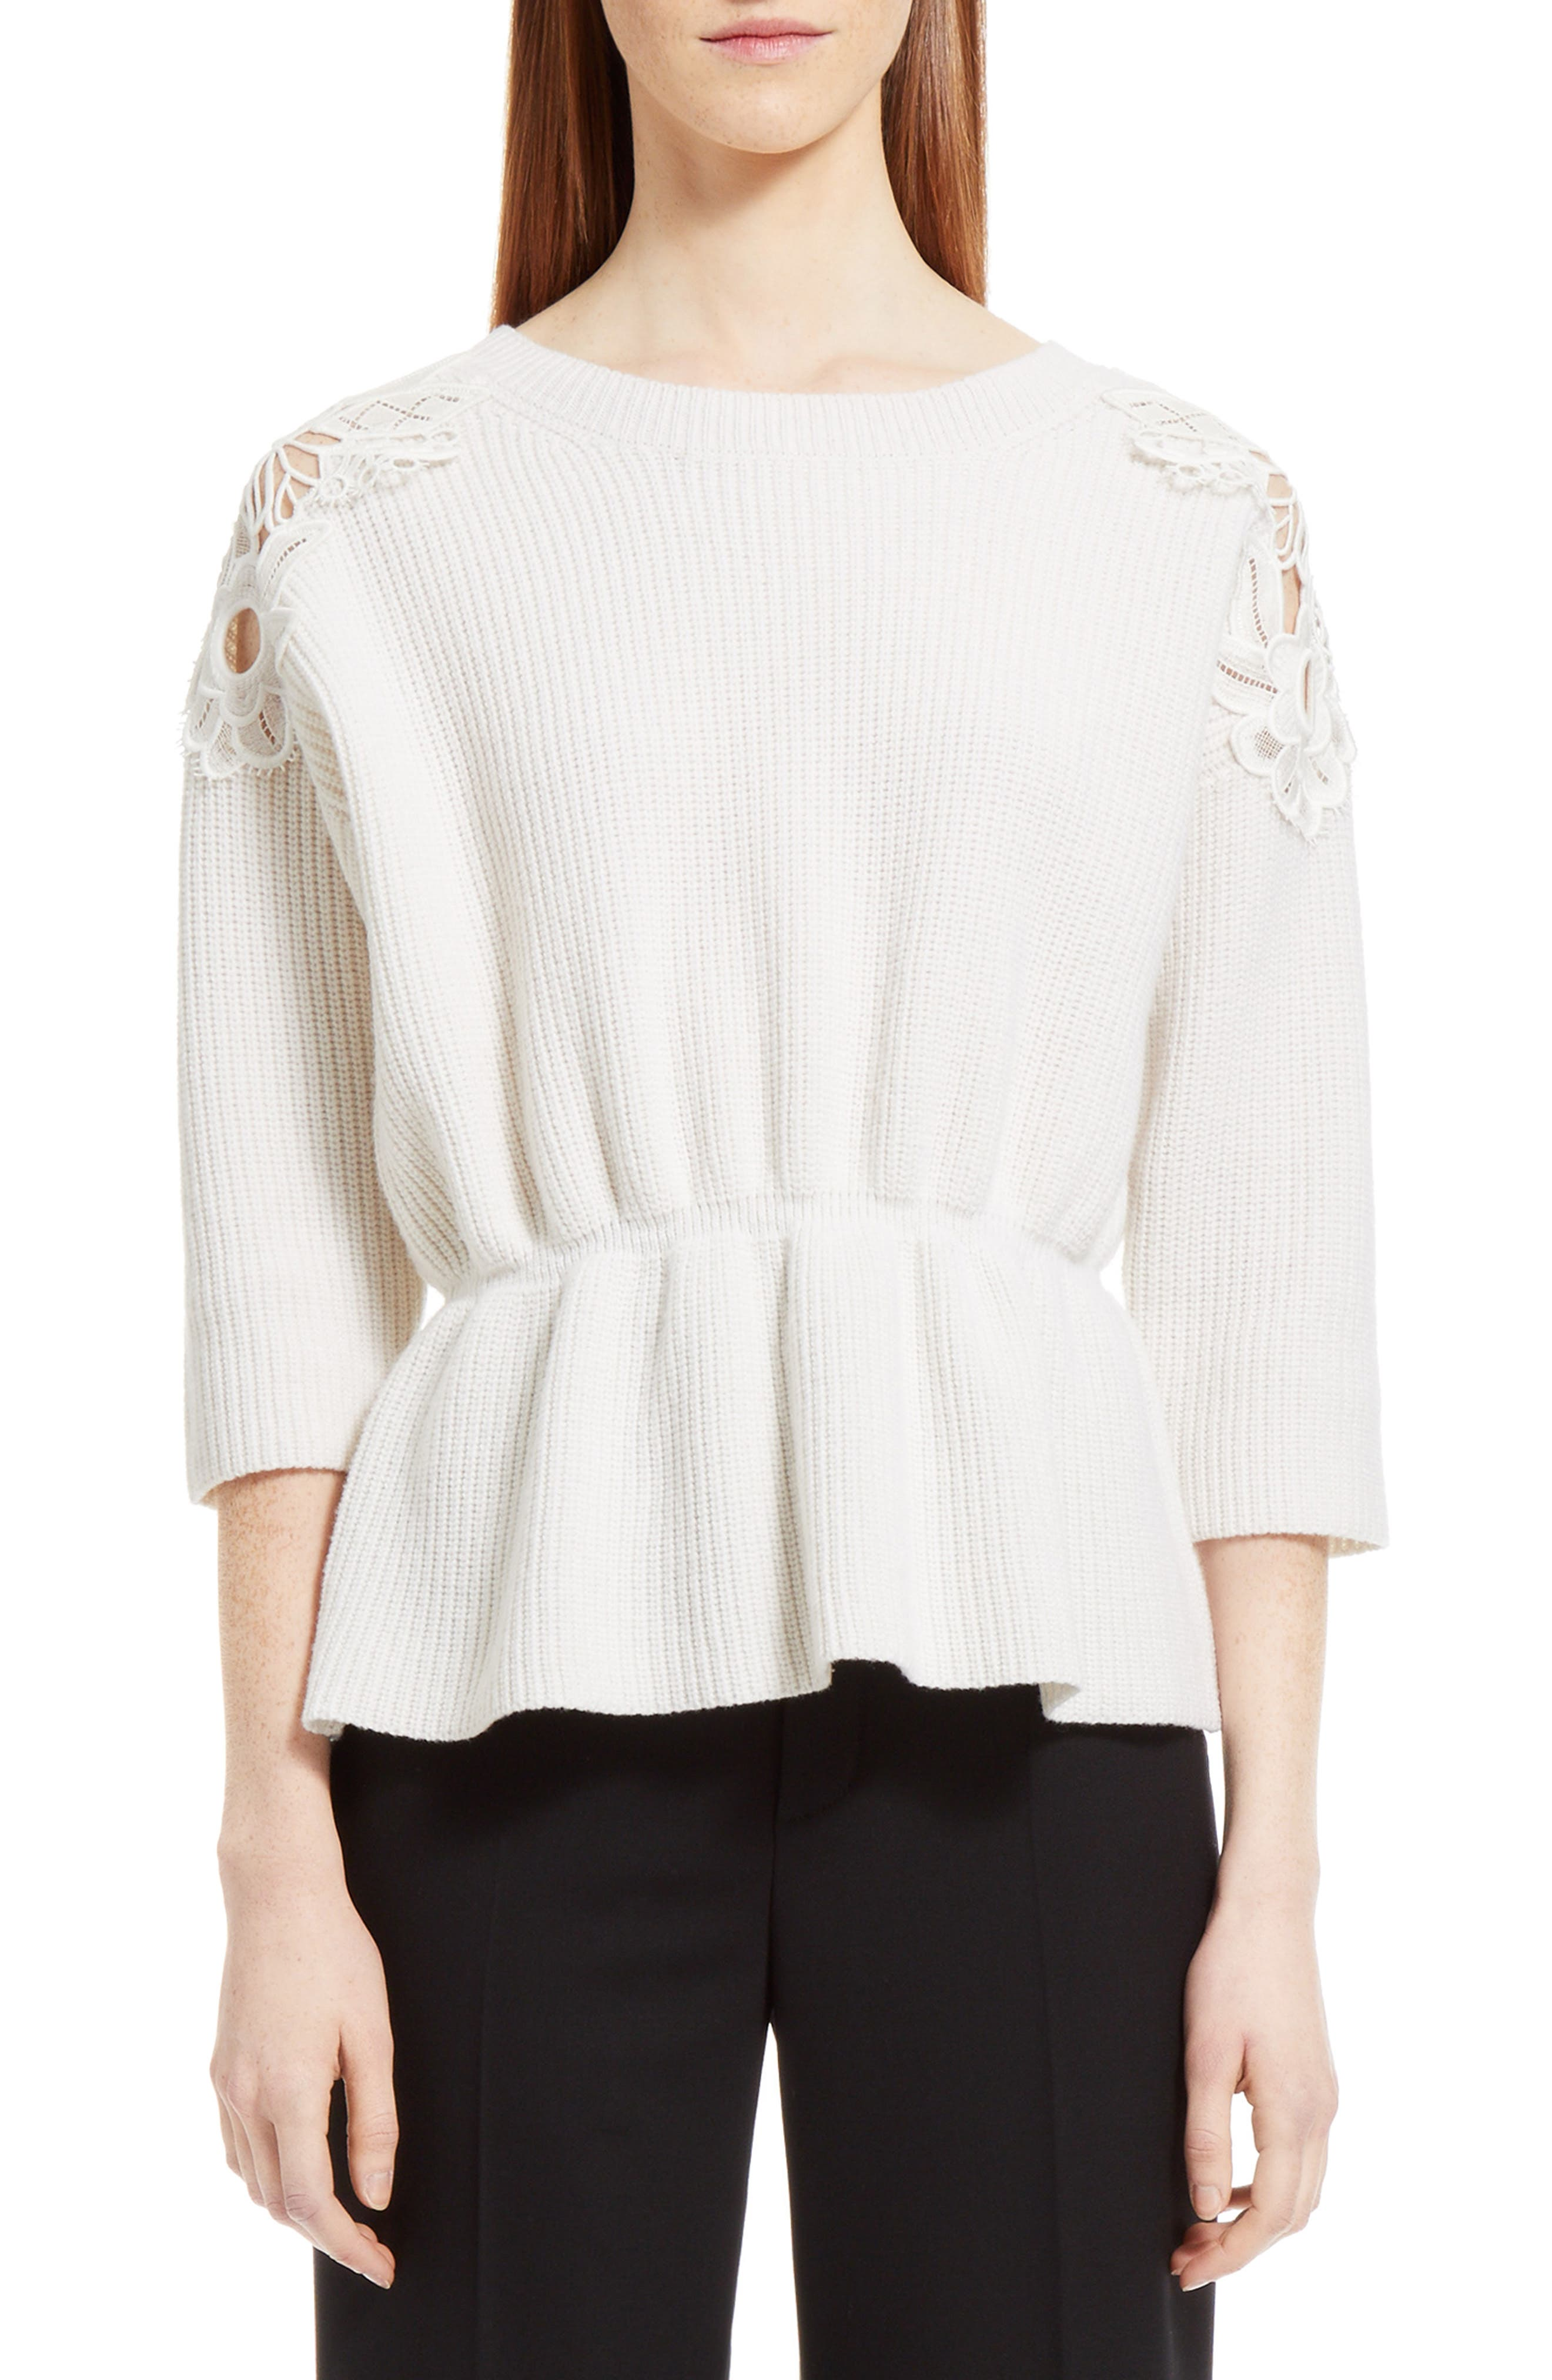 Chloé Lace Trim Merino Wool & Cashmere Sweater